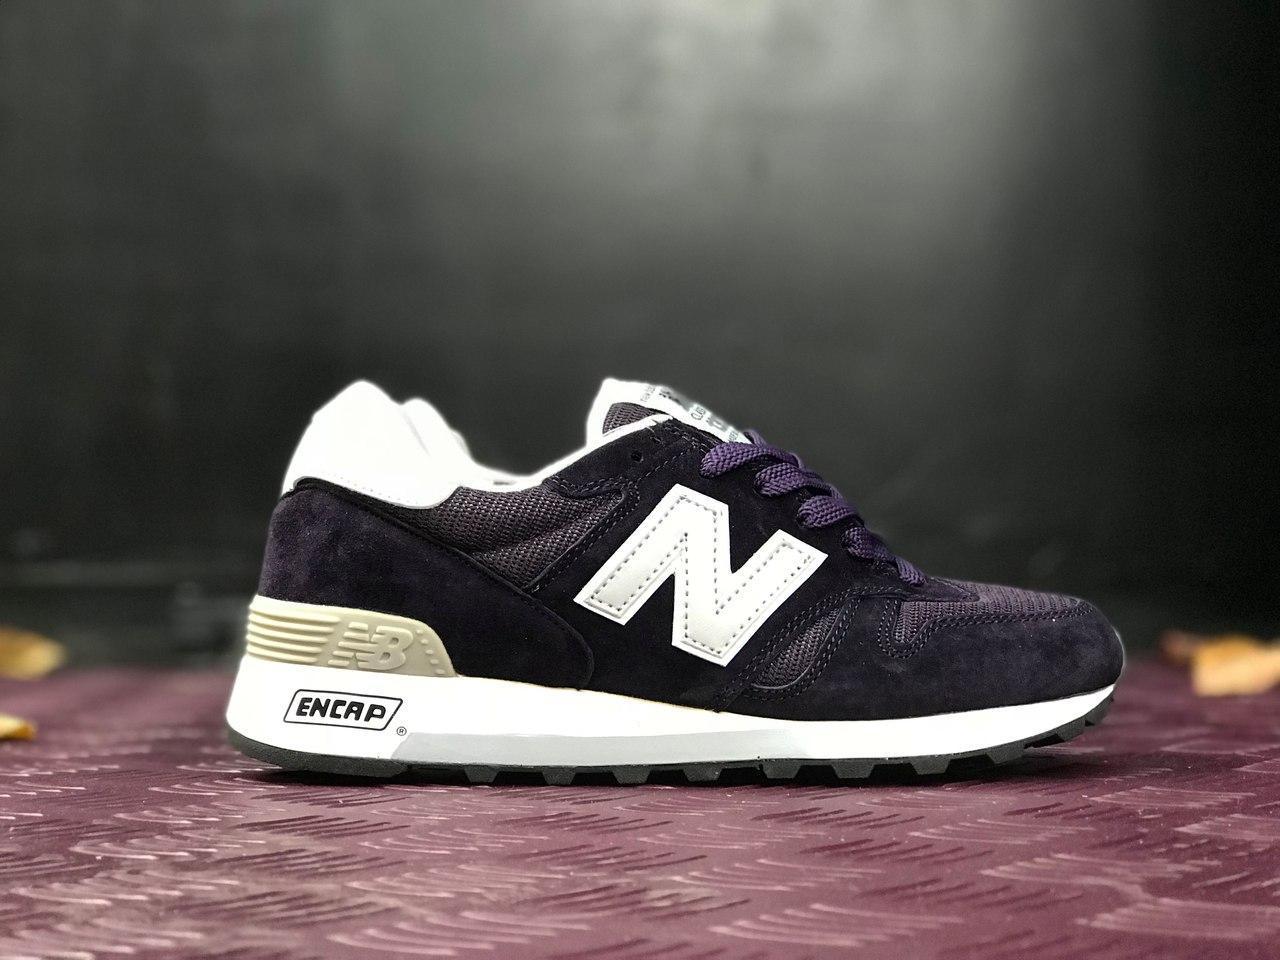 d8fef974434b Женские кроссовки New Balance 1300 Purple. Топ качество. Живое фото (Реплика  ААА+